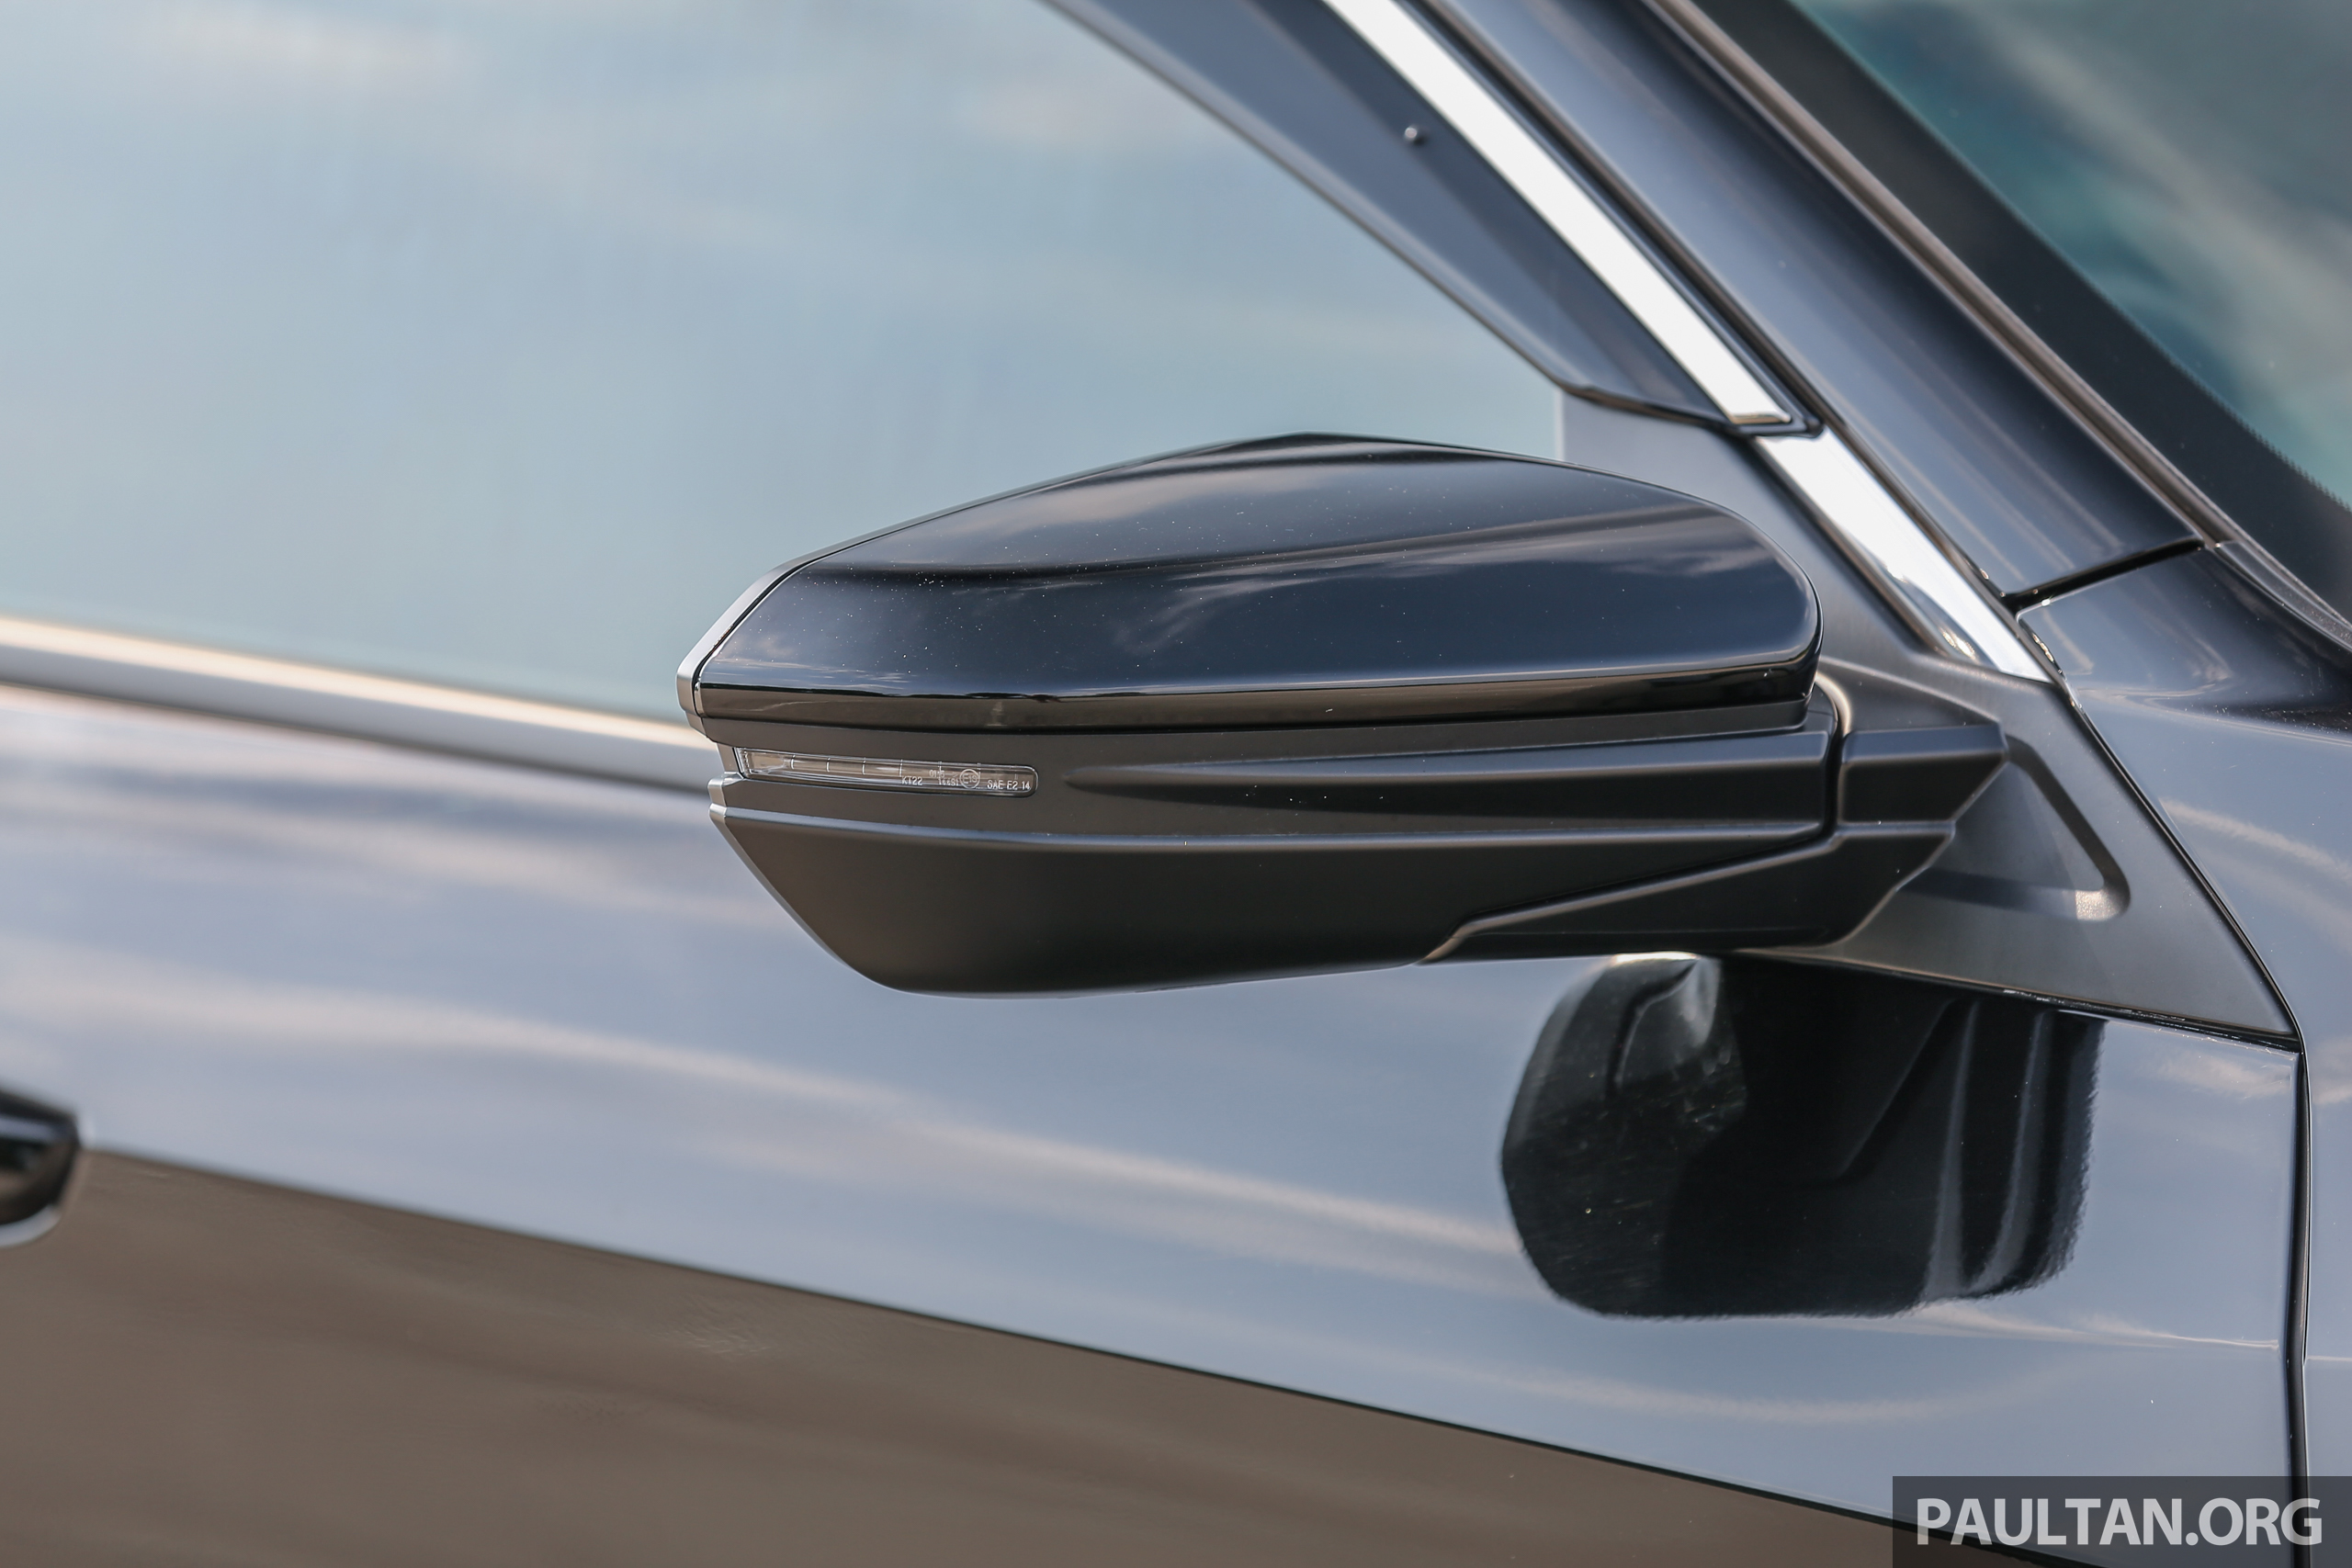 Honda Civic 1 >> GALLERY: Honda Civic 1.8S – it's quietly competent Paul Tan - Image 602435